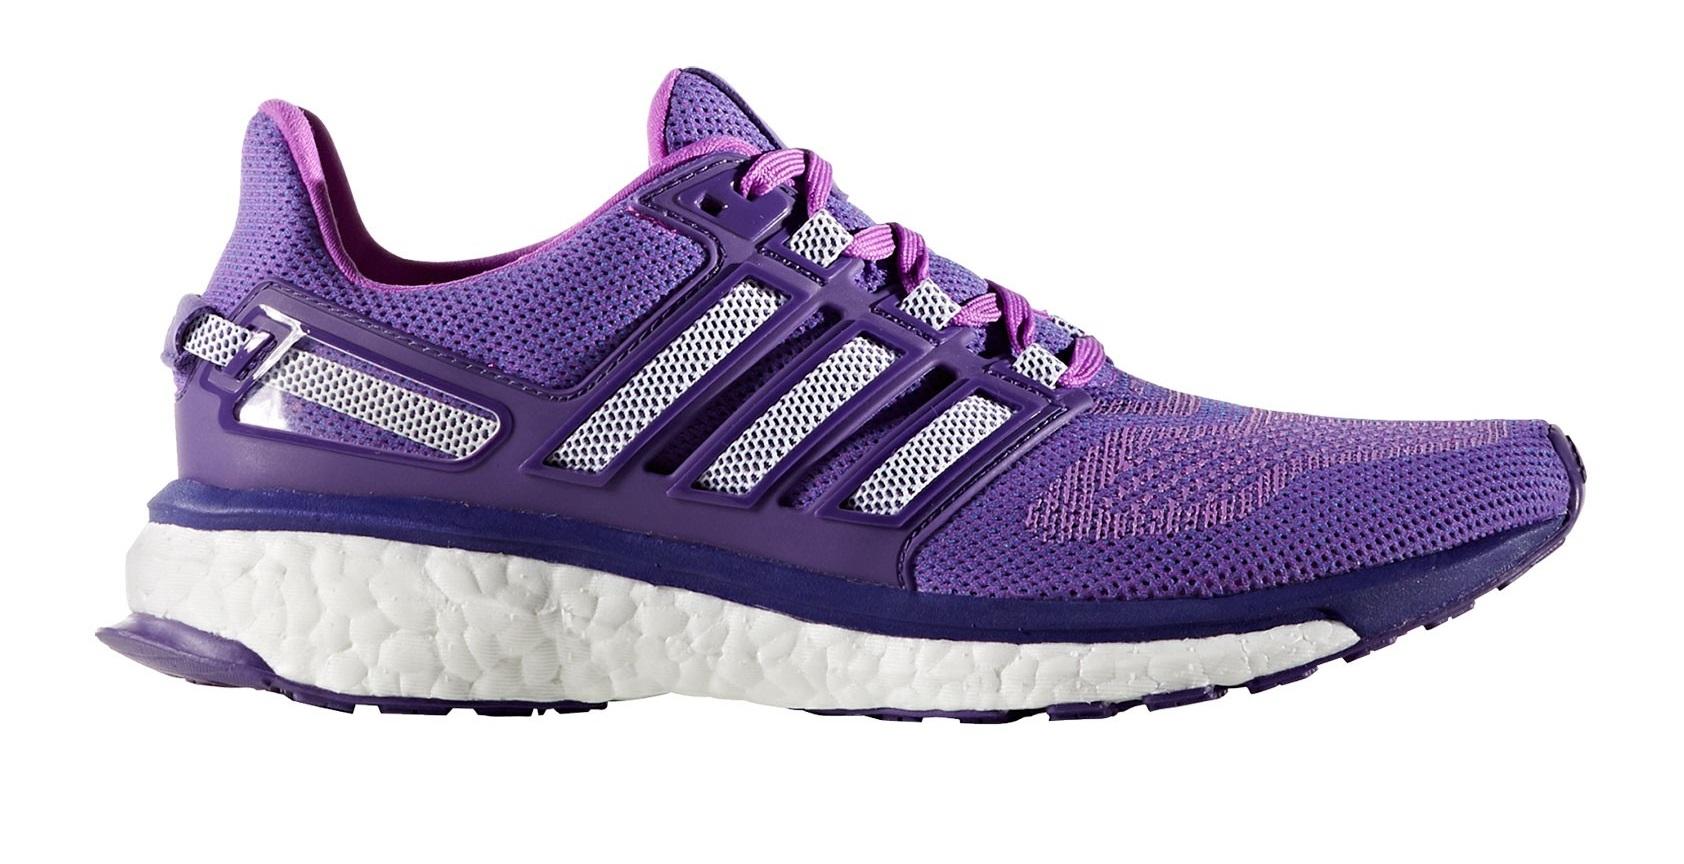 Chaussures running adidas pronateur